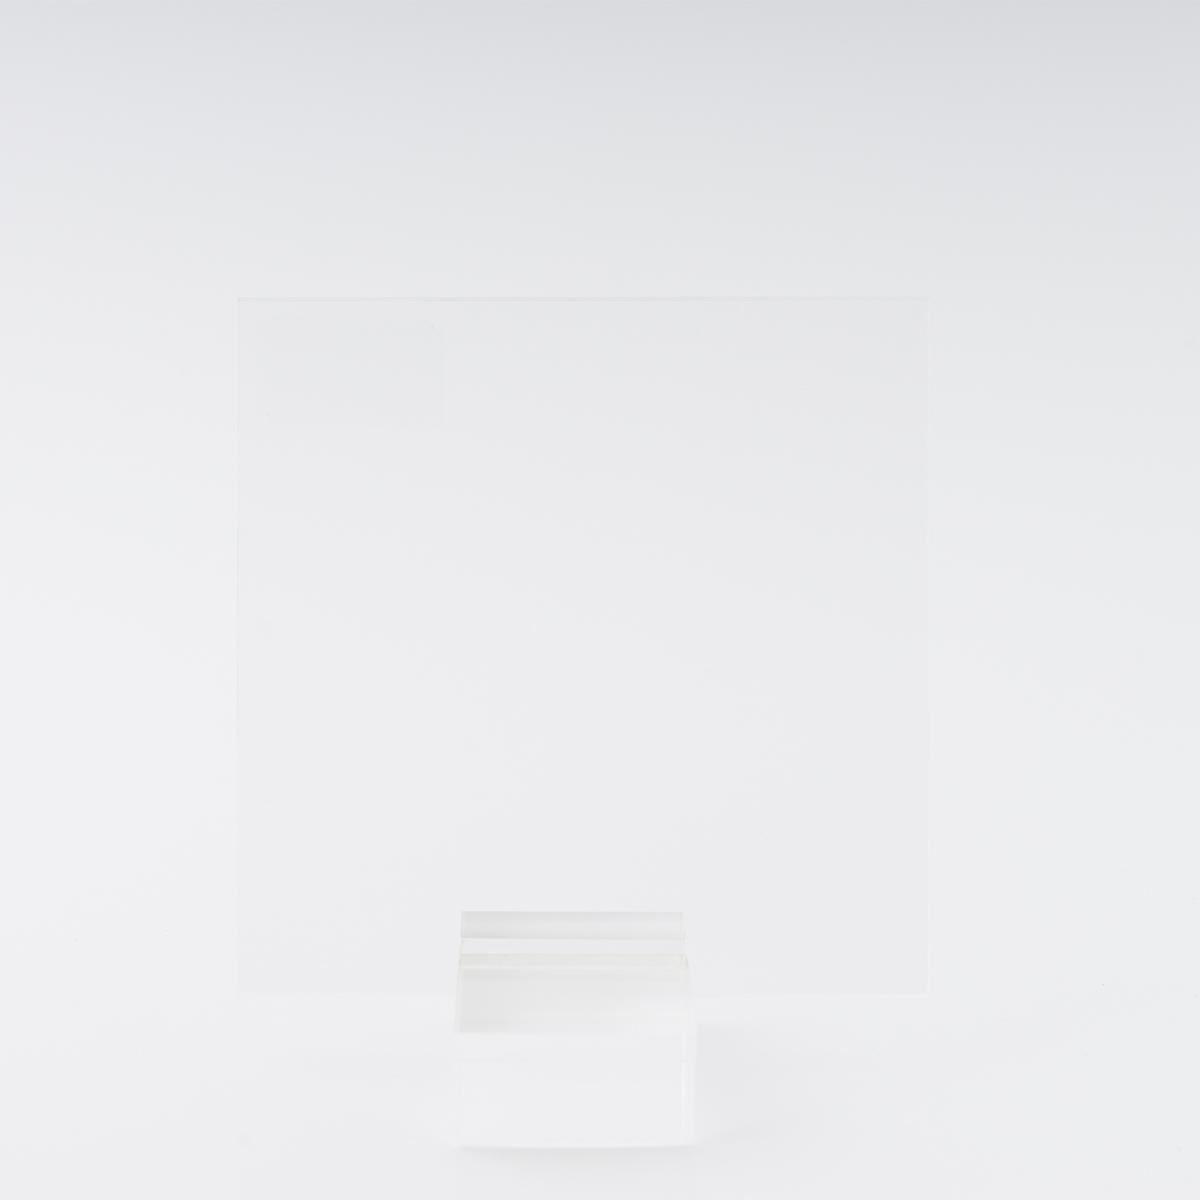 Museum Grade Perspex Acrylic Sheet Plastic Stockist